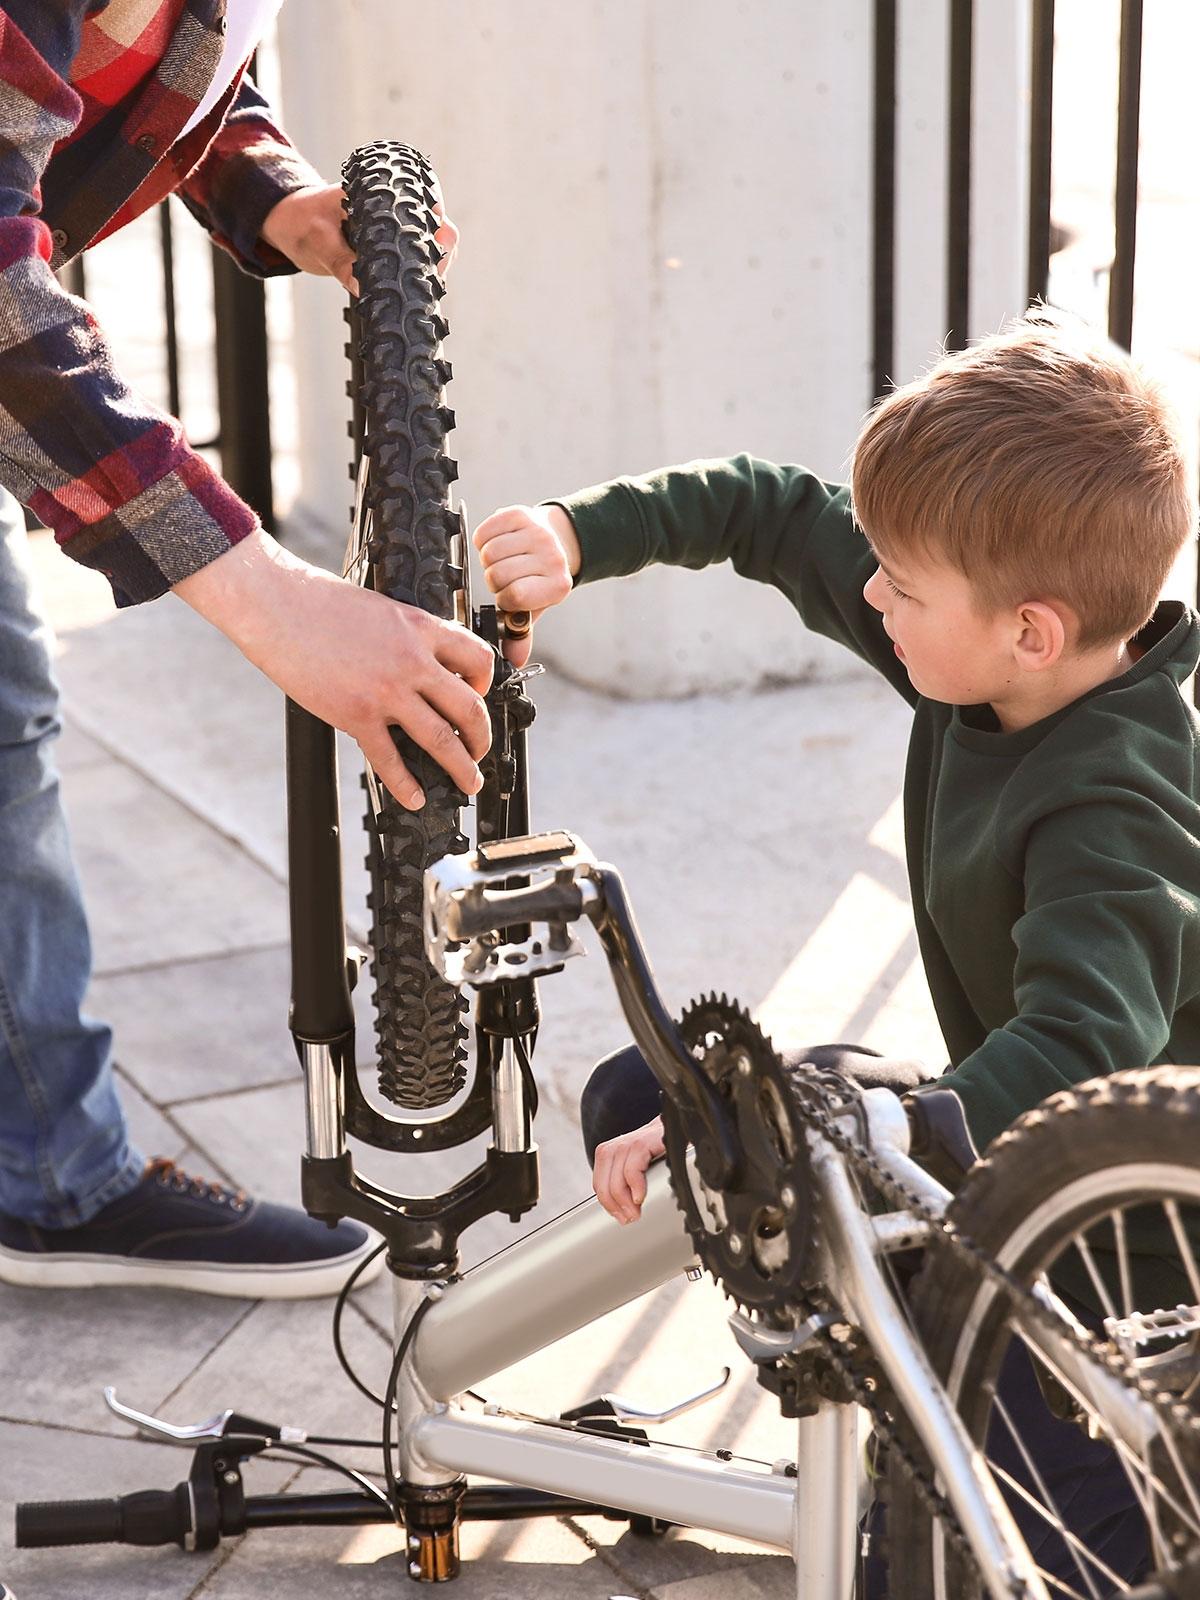 daniel-rall-bike-artist-hornberg-bike-coaching-sicher